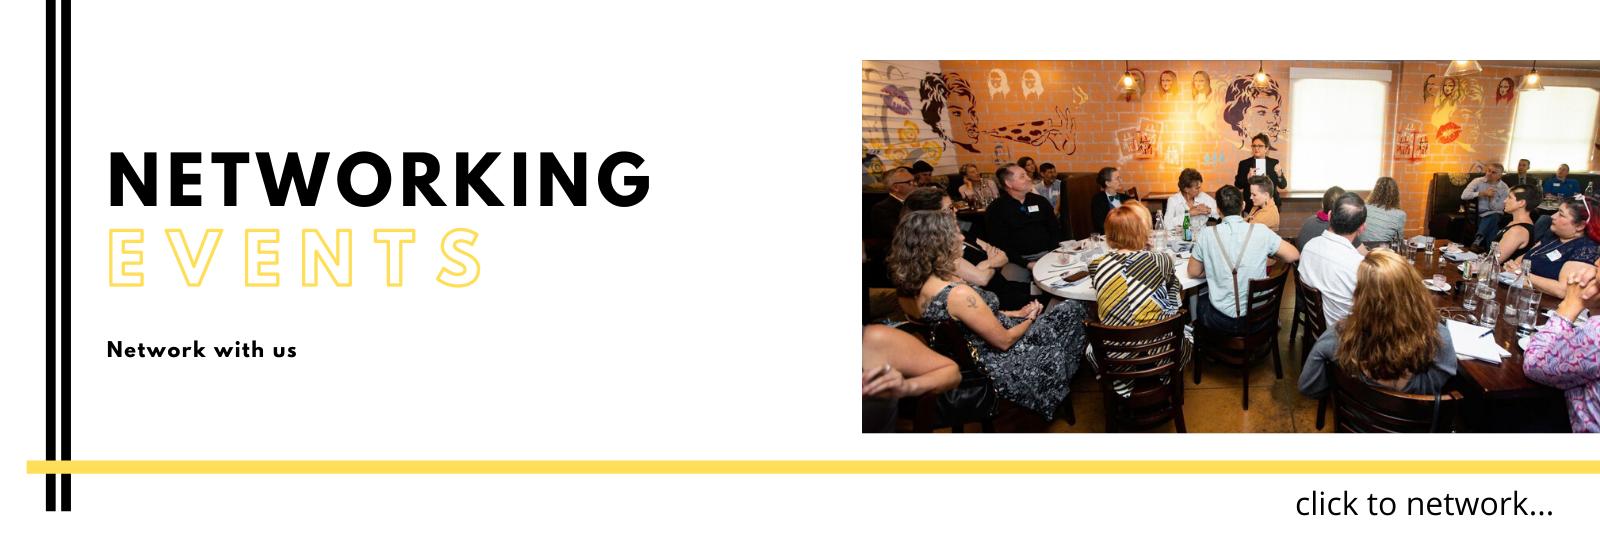 networking-final-slide-3.png